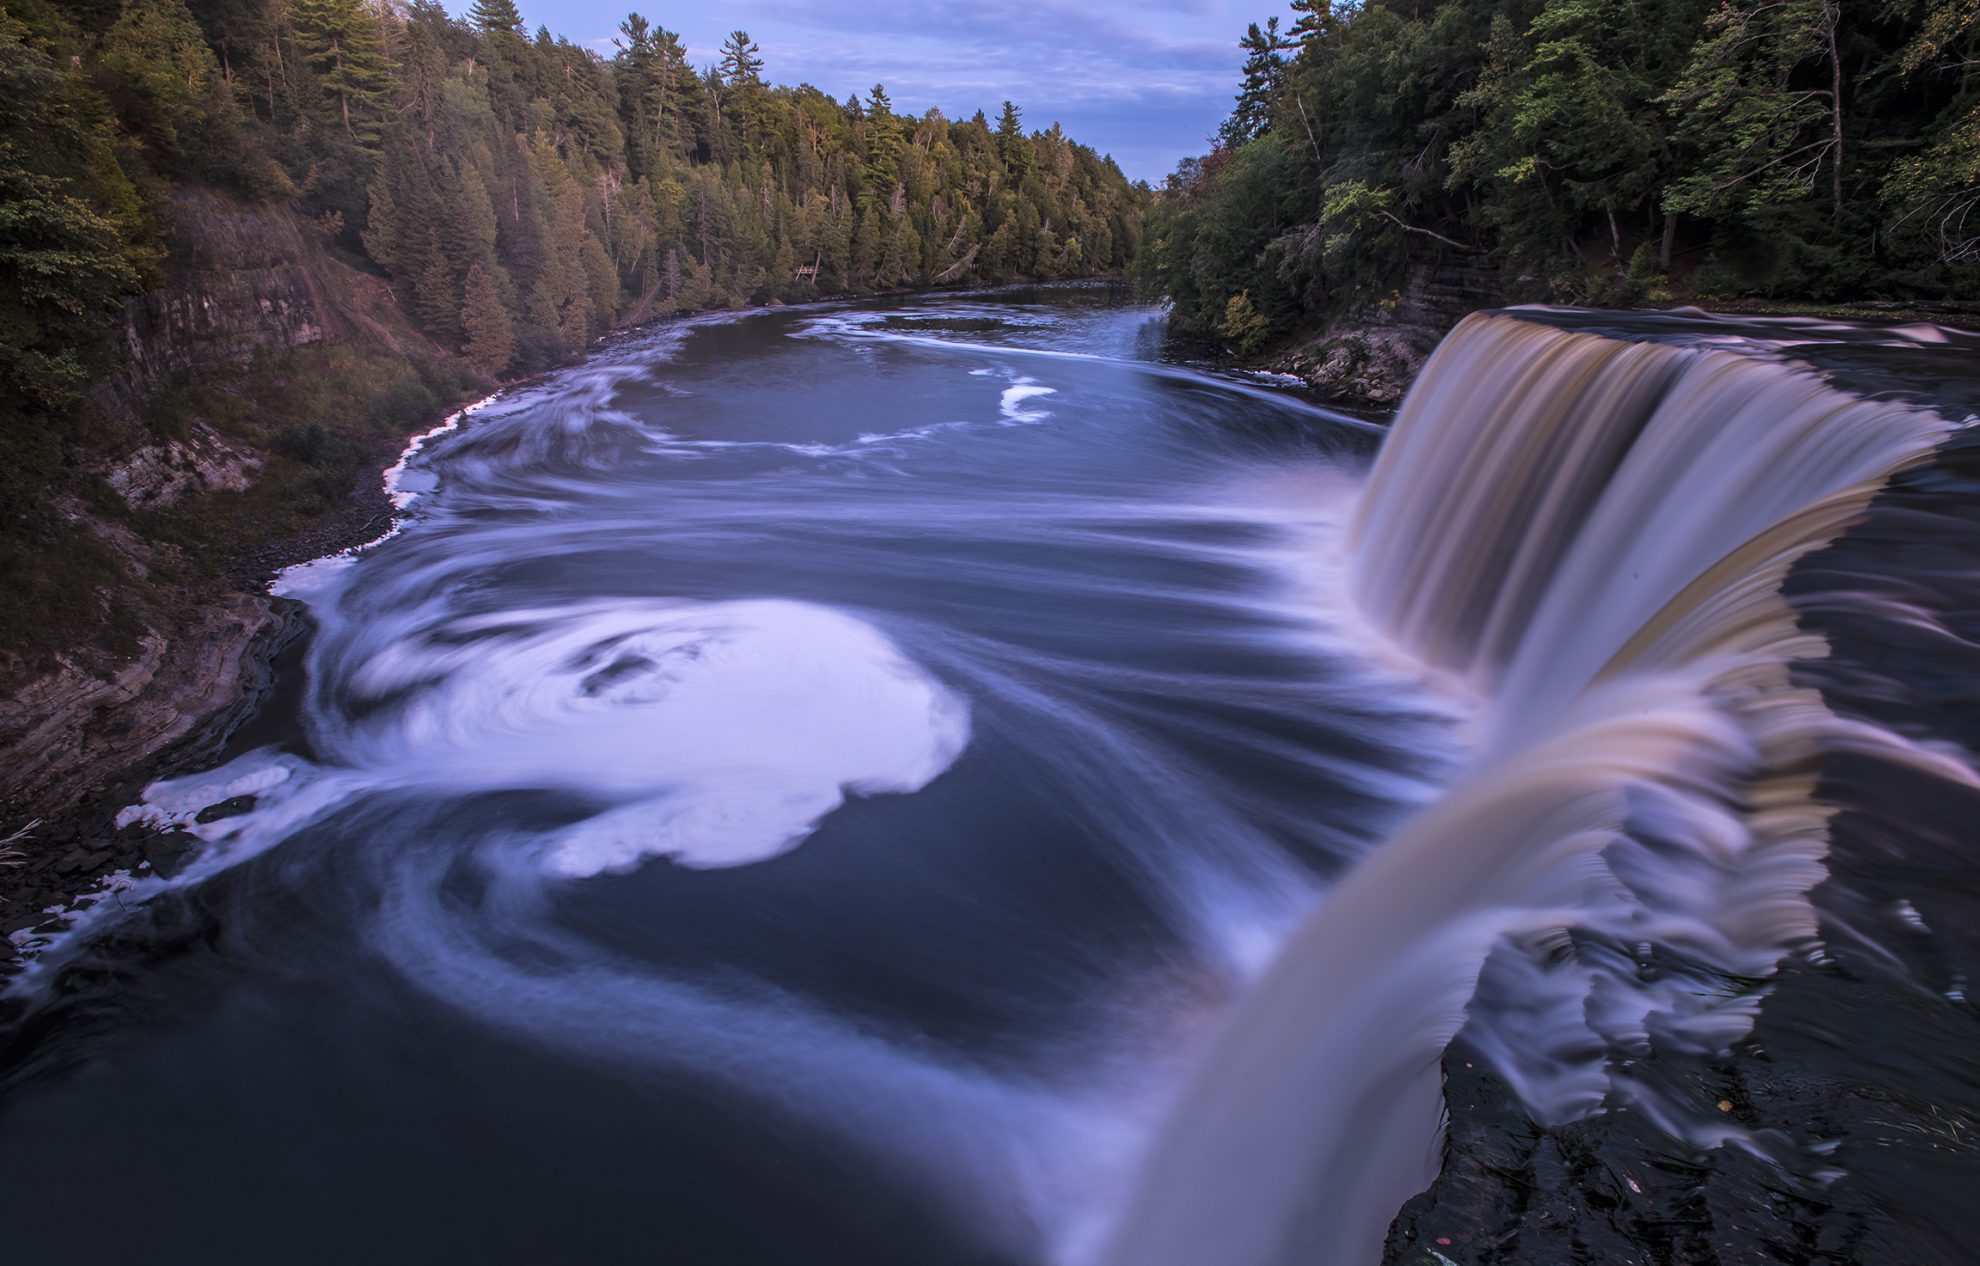 Photo of Tahquamenon Falls in Upper Peninsula of Michigan